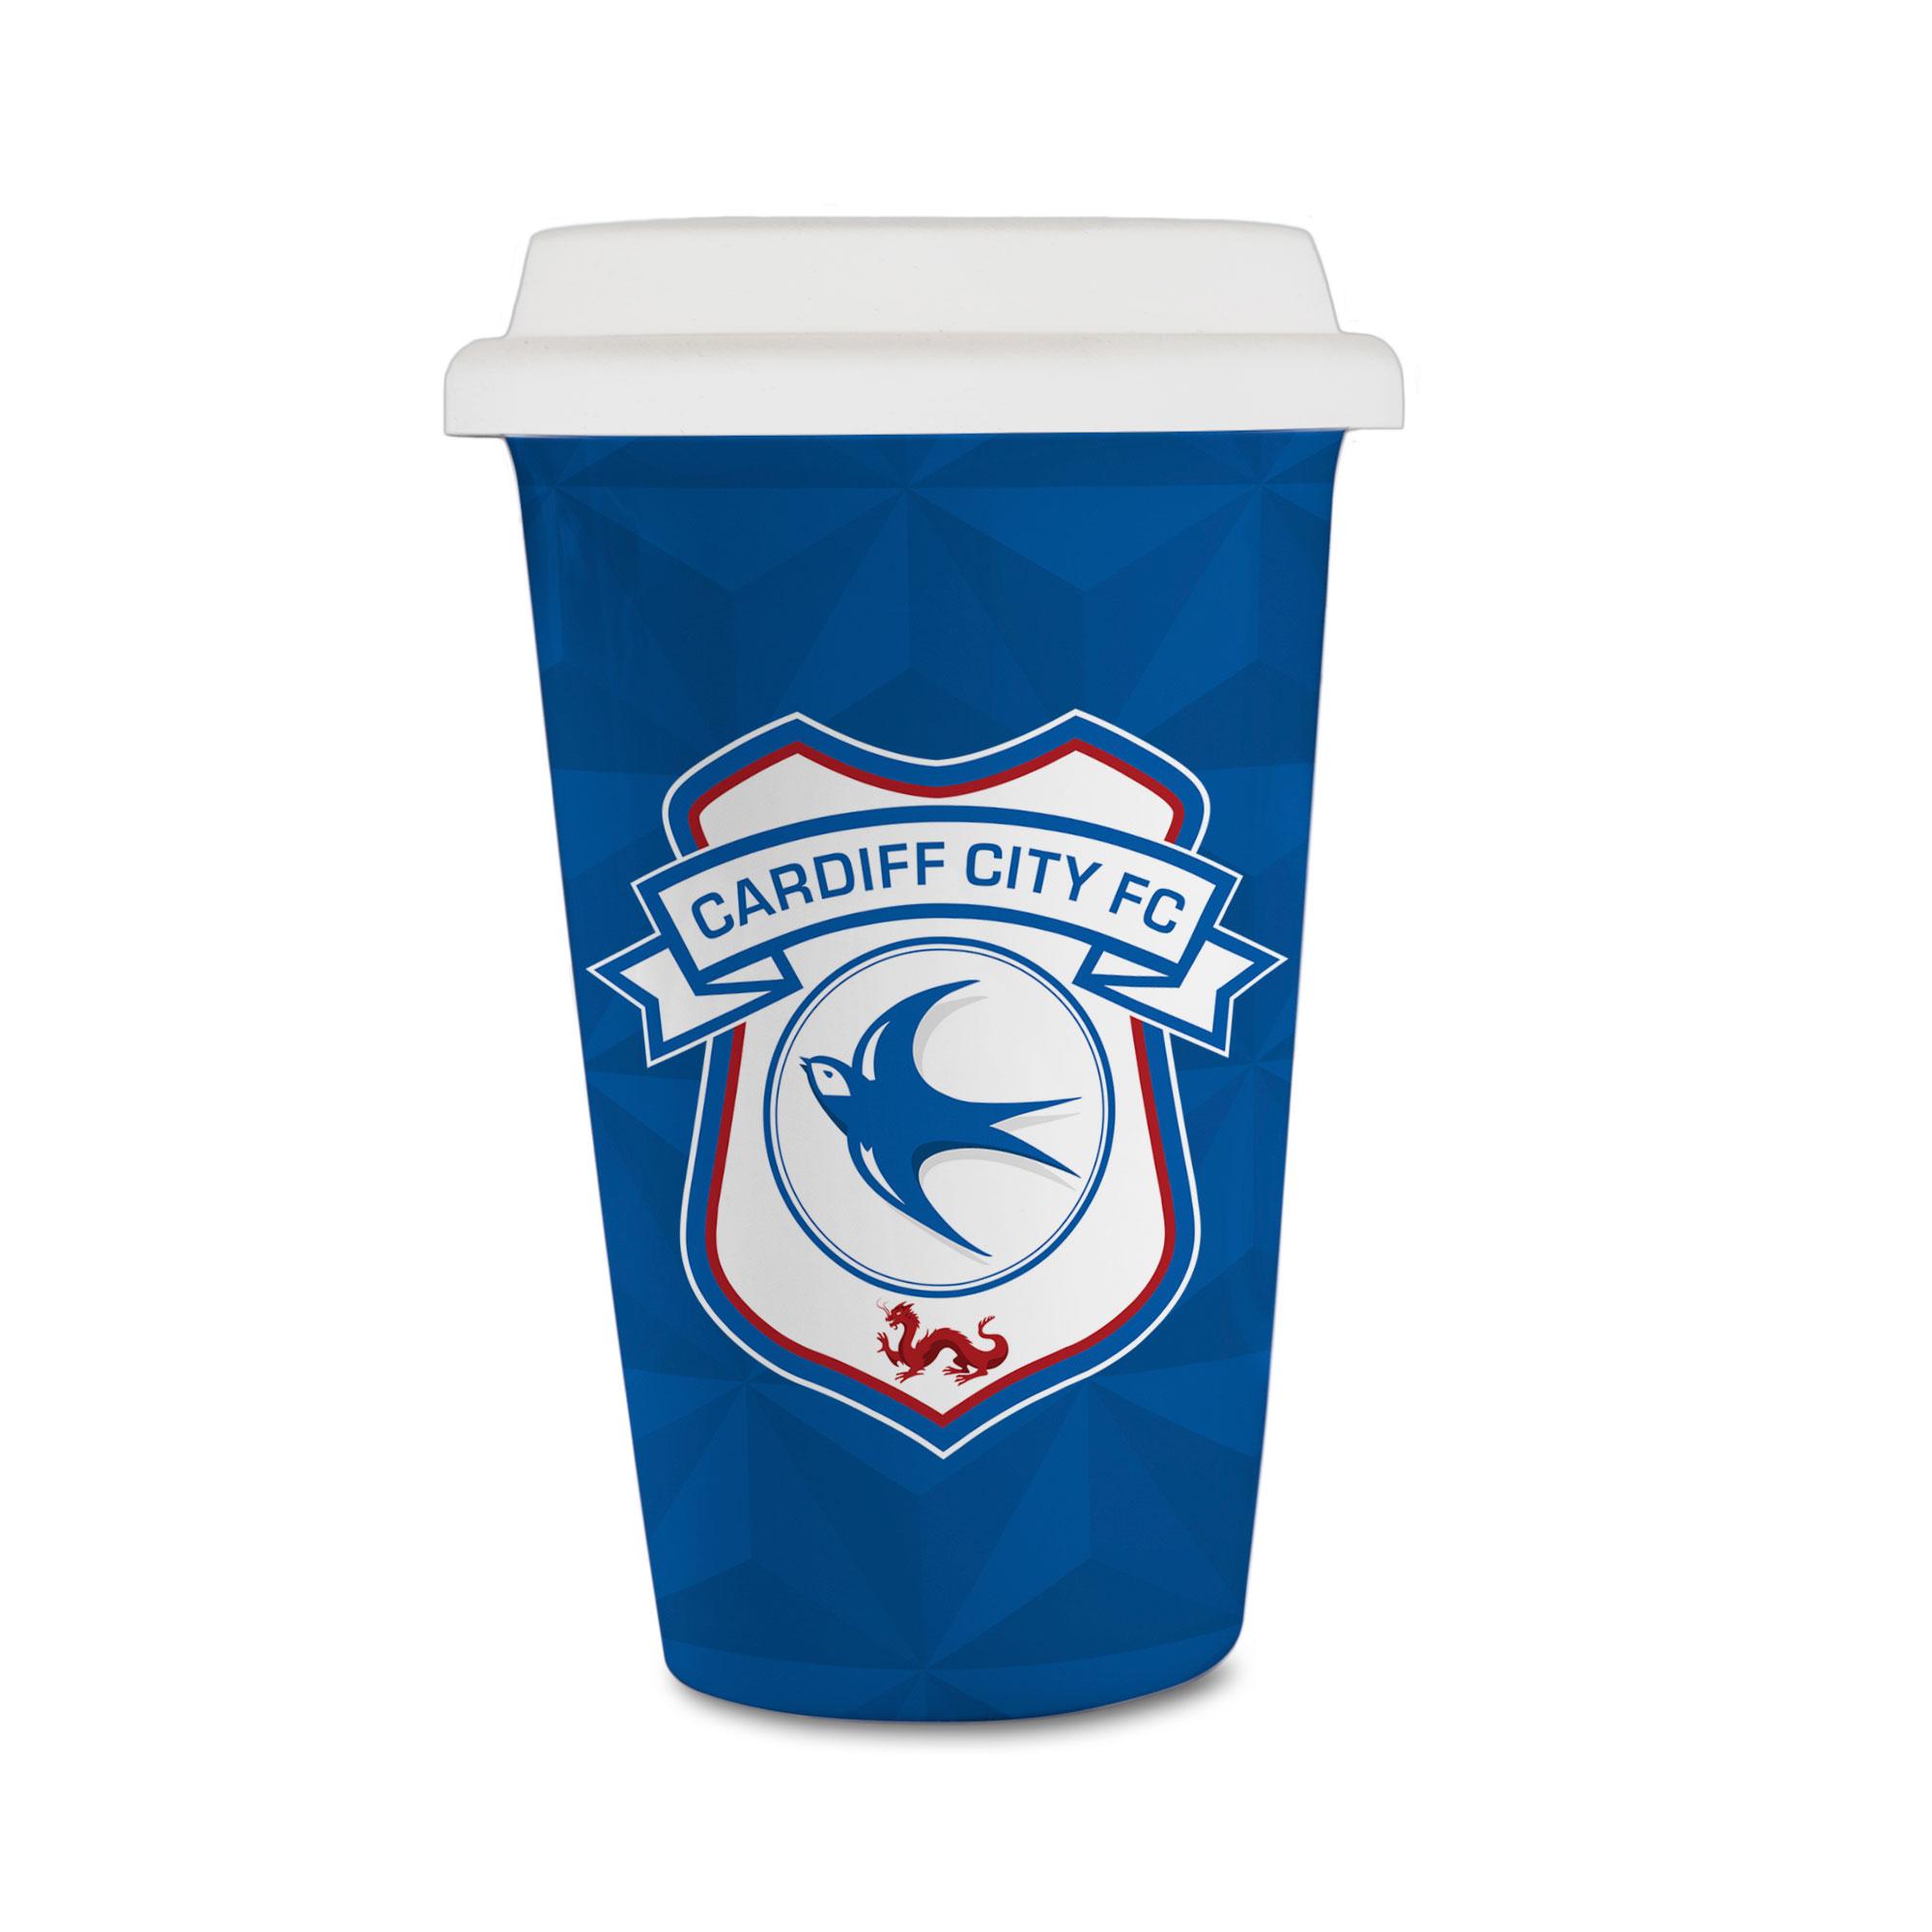 Cardiff City FC Crest Reusable Cup